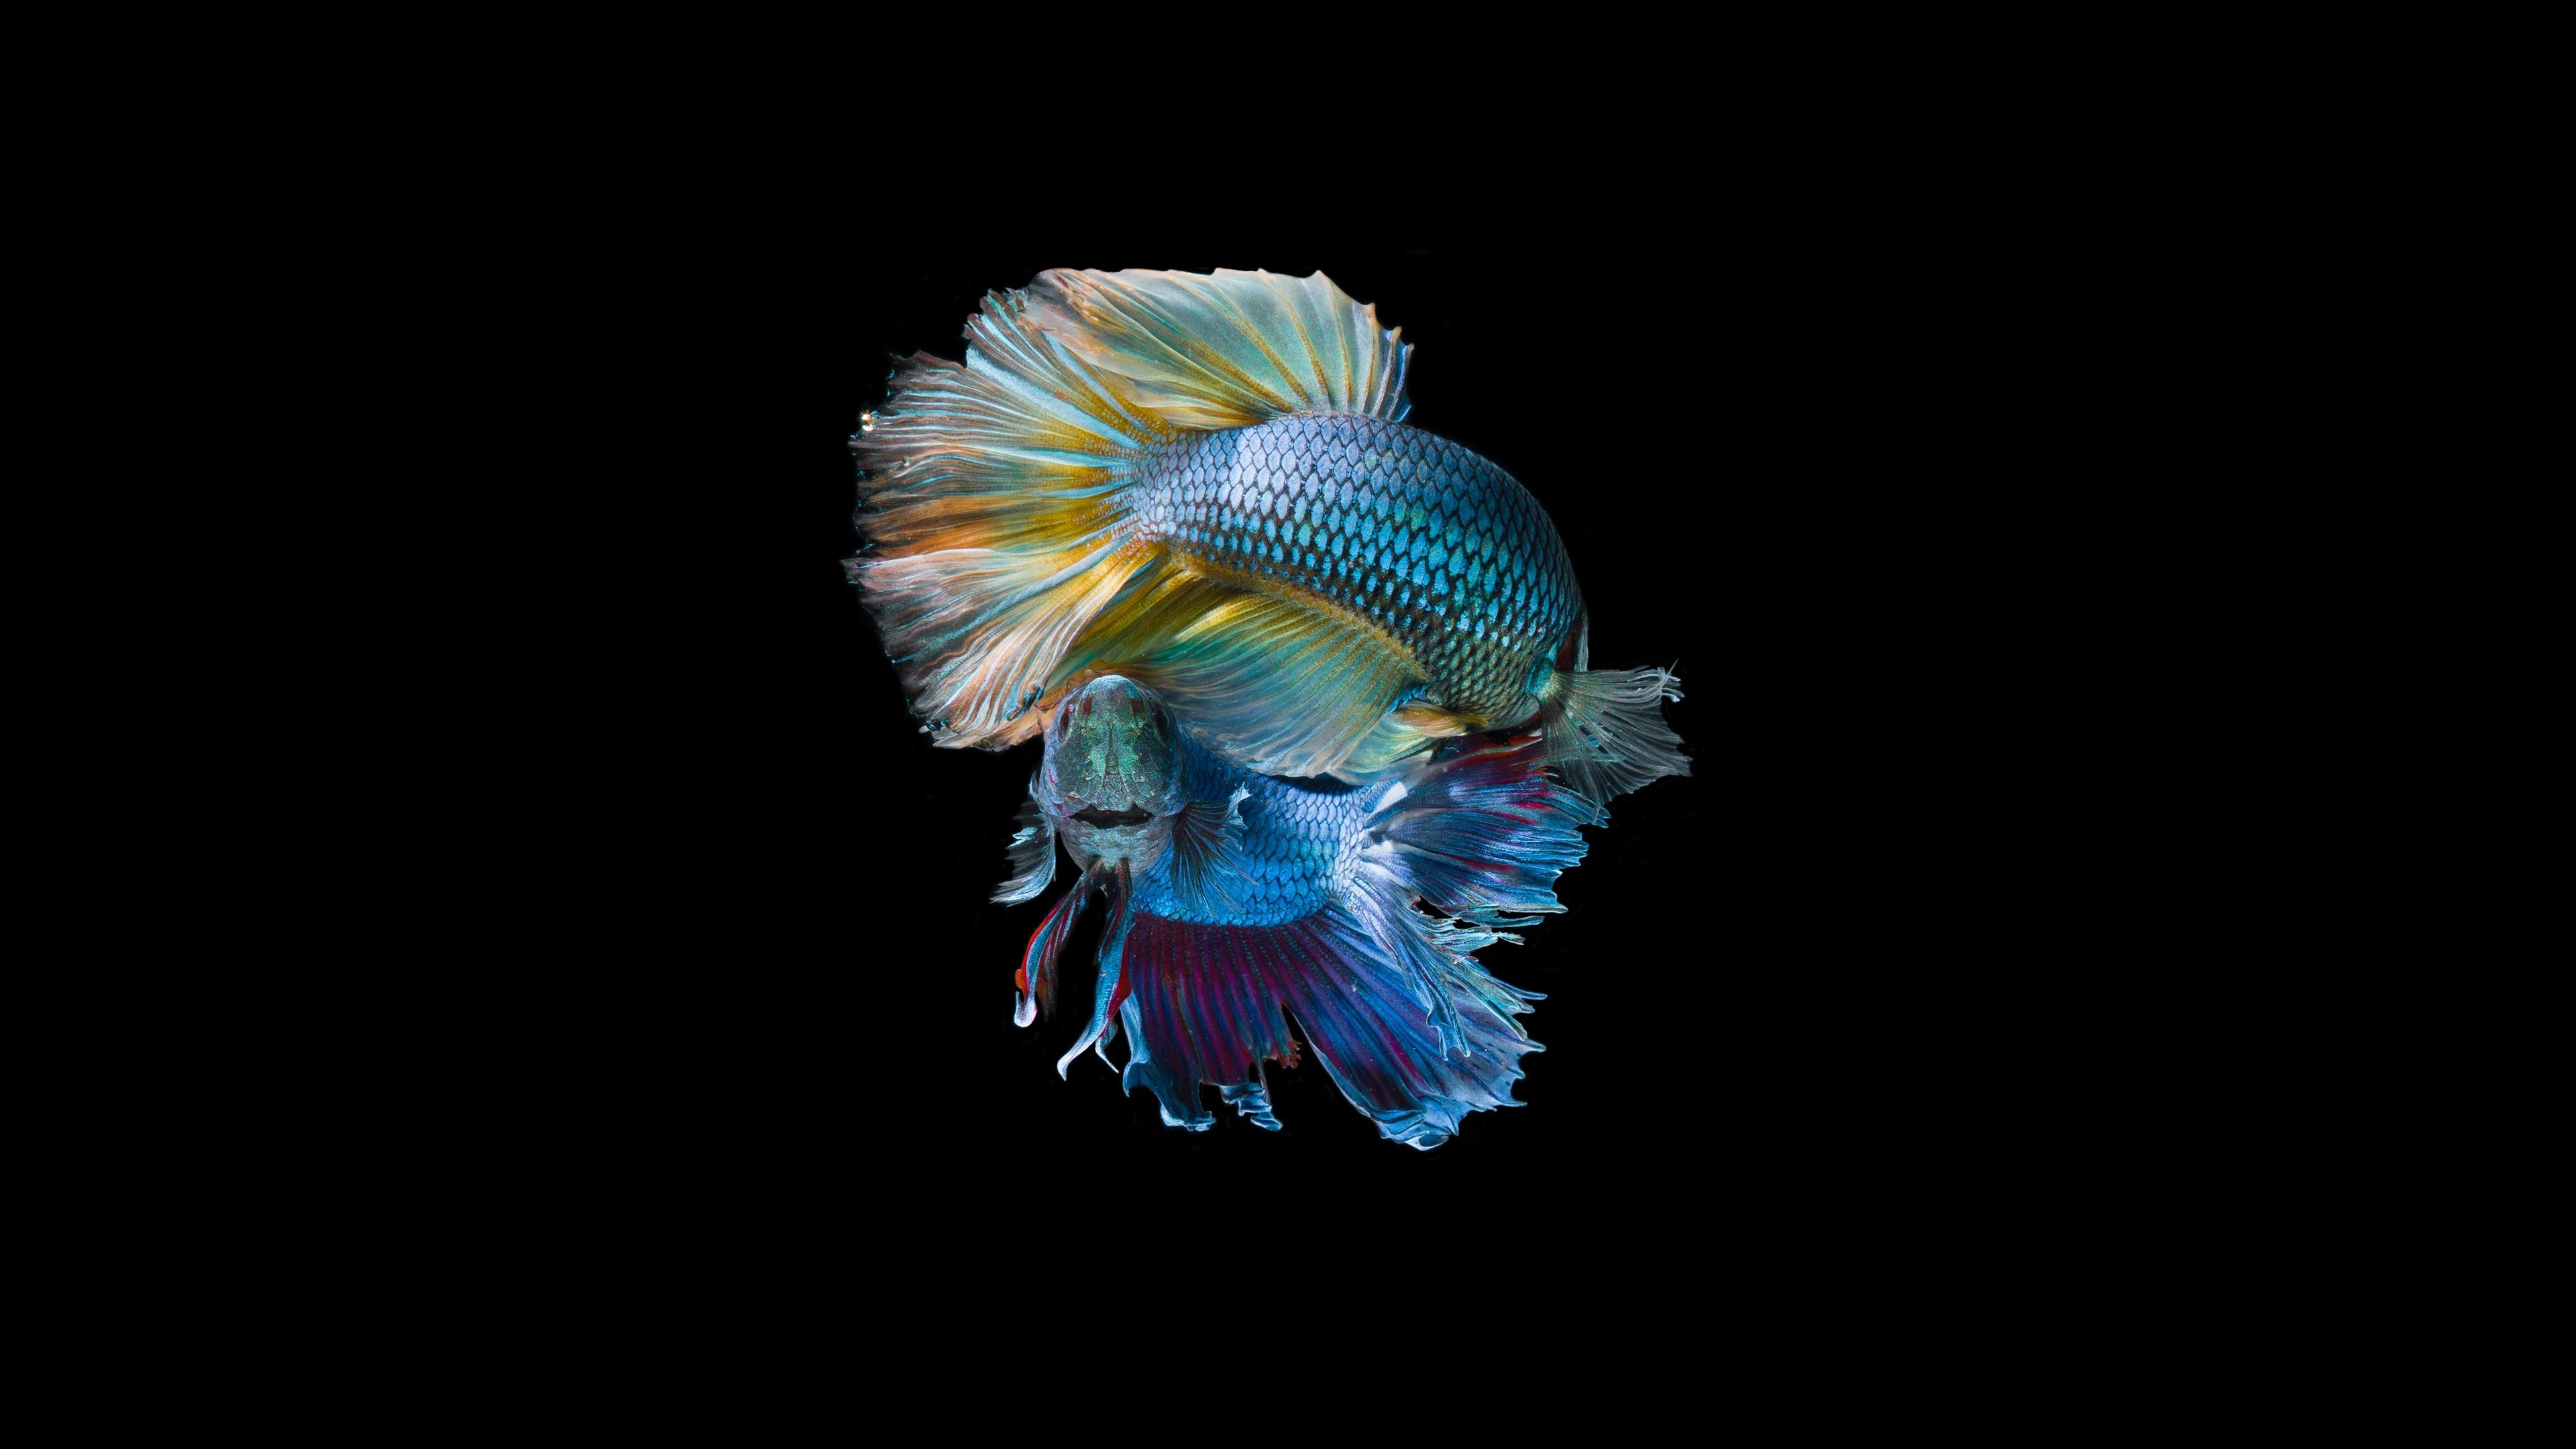 fishes fish glitter tail squama 4k 1542242152 - fishes, fish, glitter, tail, squama 4k - Glitter, Fishes, Fish